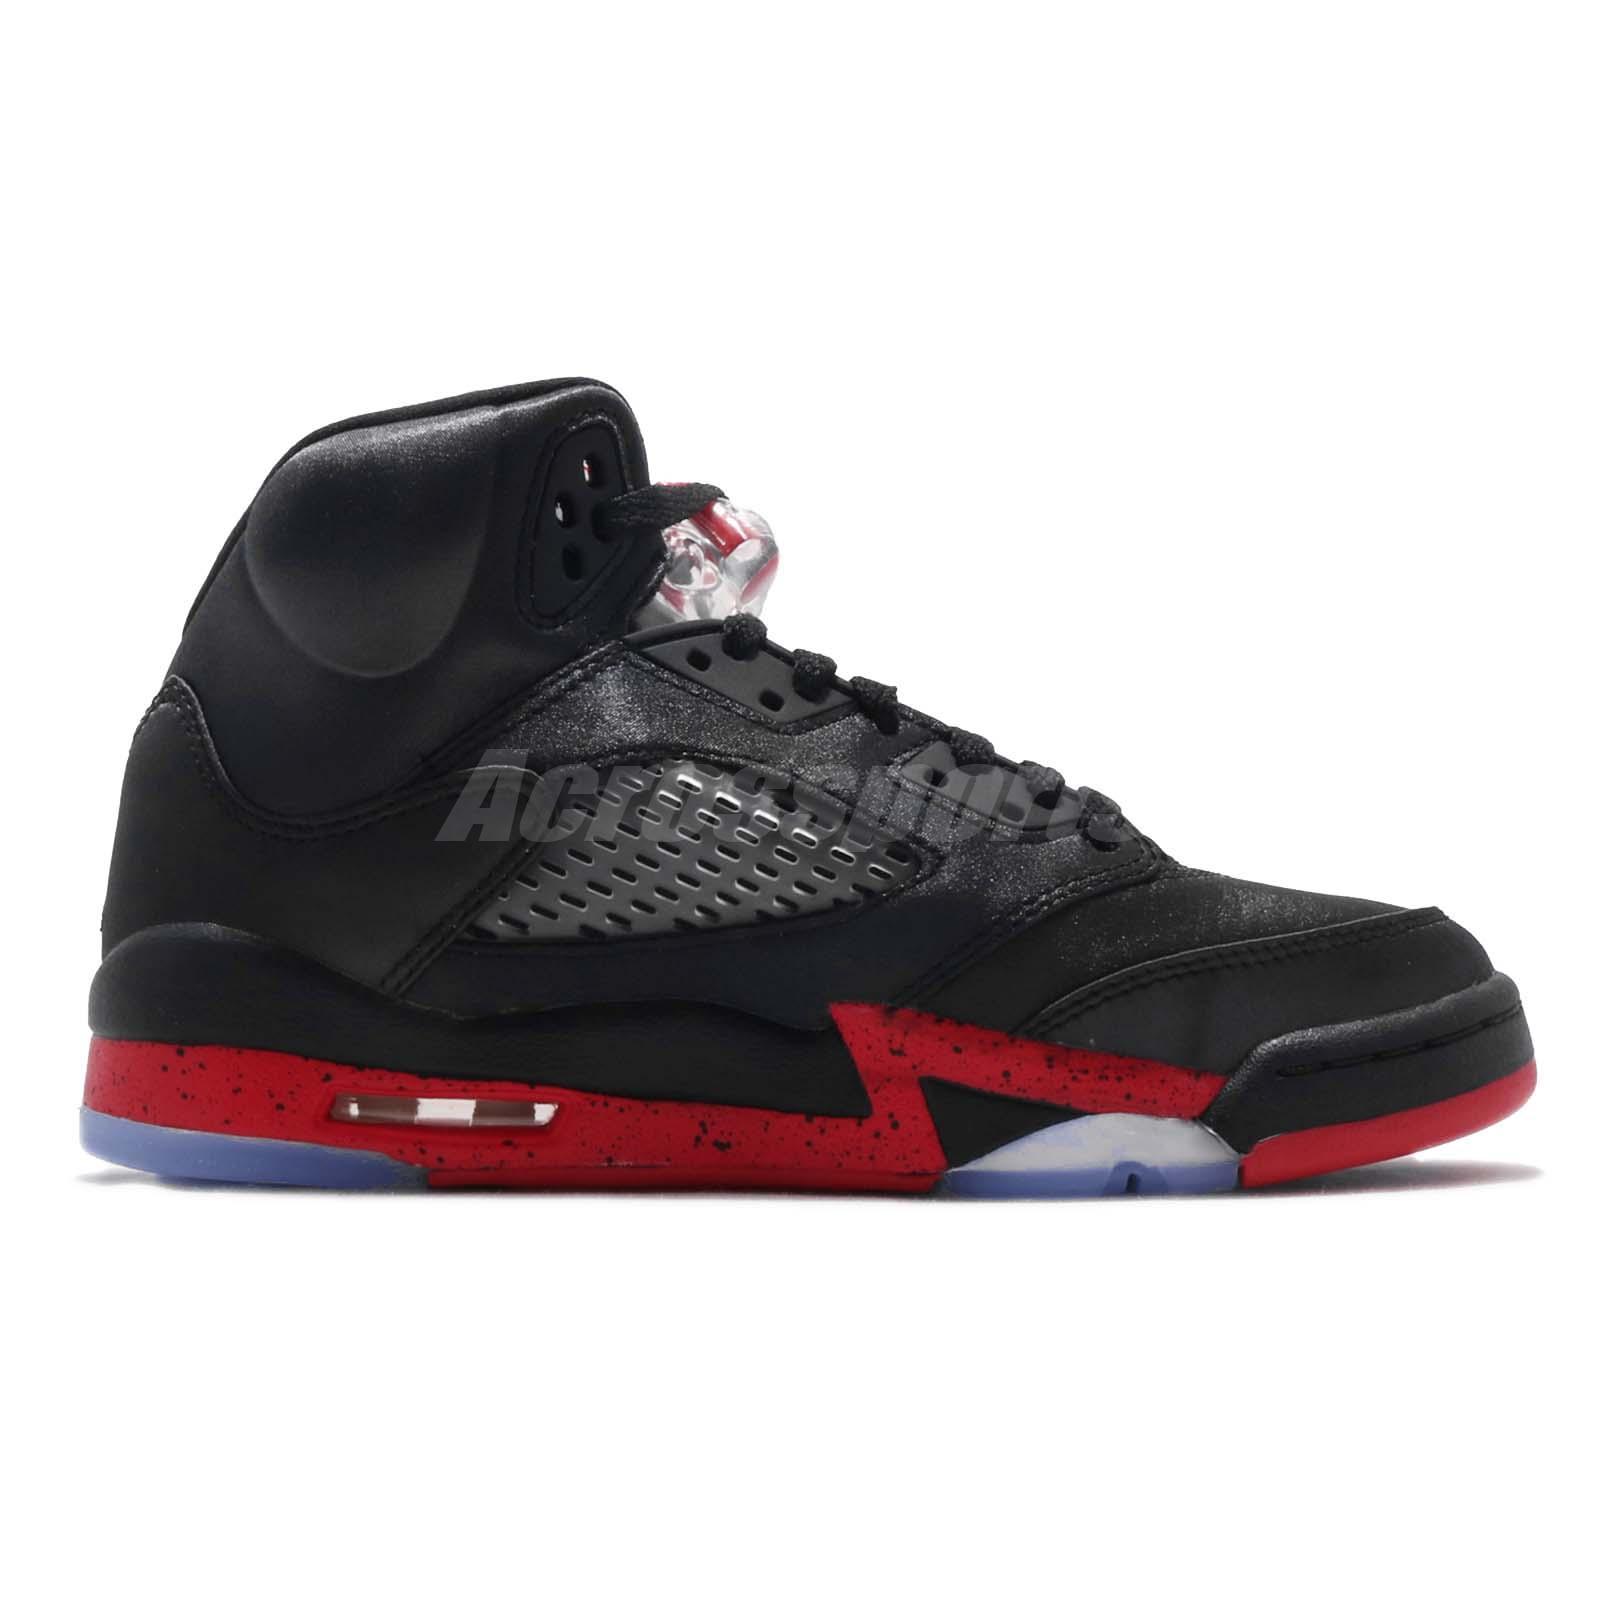 Nike Air Jordan 5 Retro BG GS Satin Black Red Bred V AJ5 Youth Kids ... aa728994f